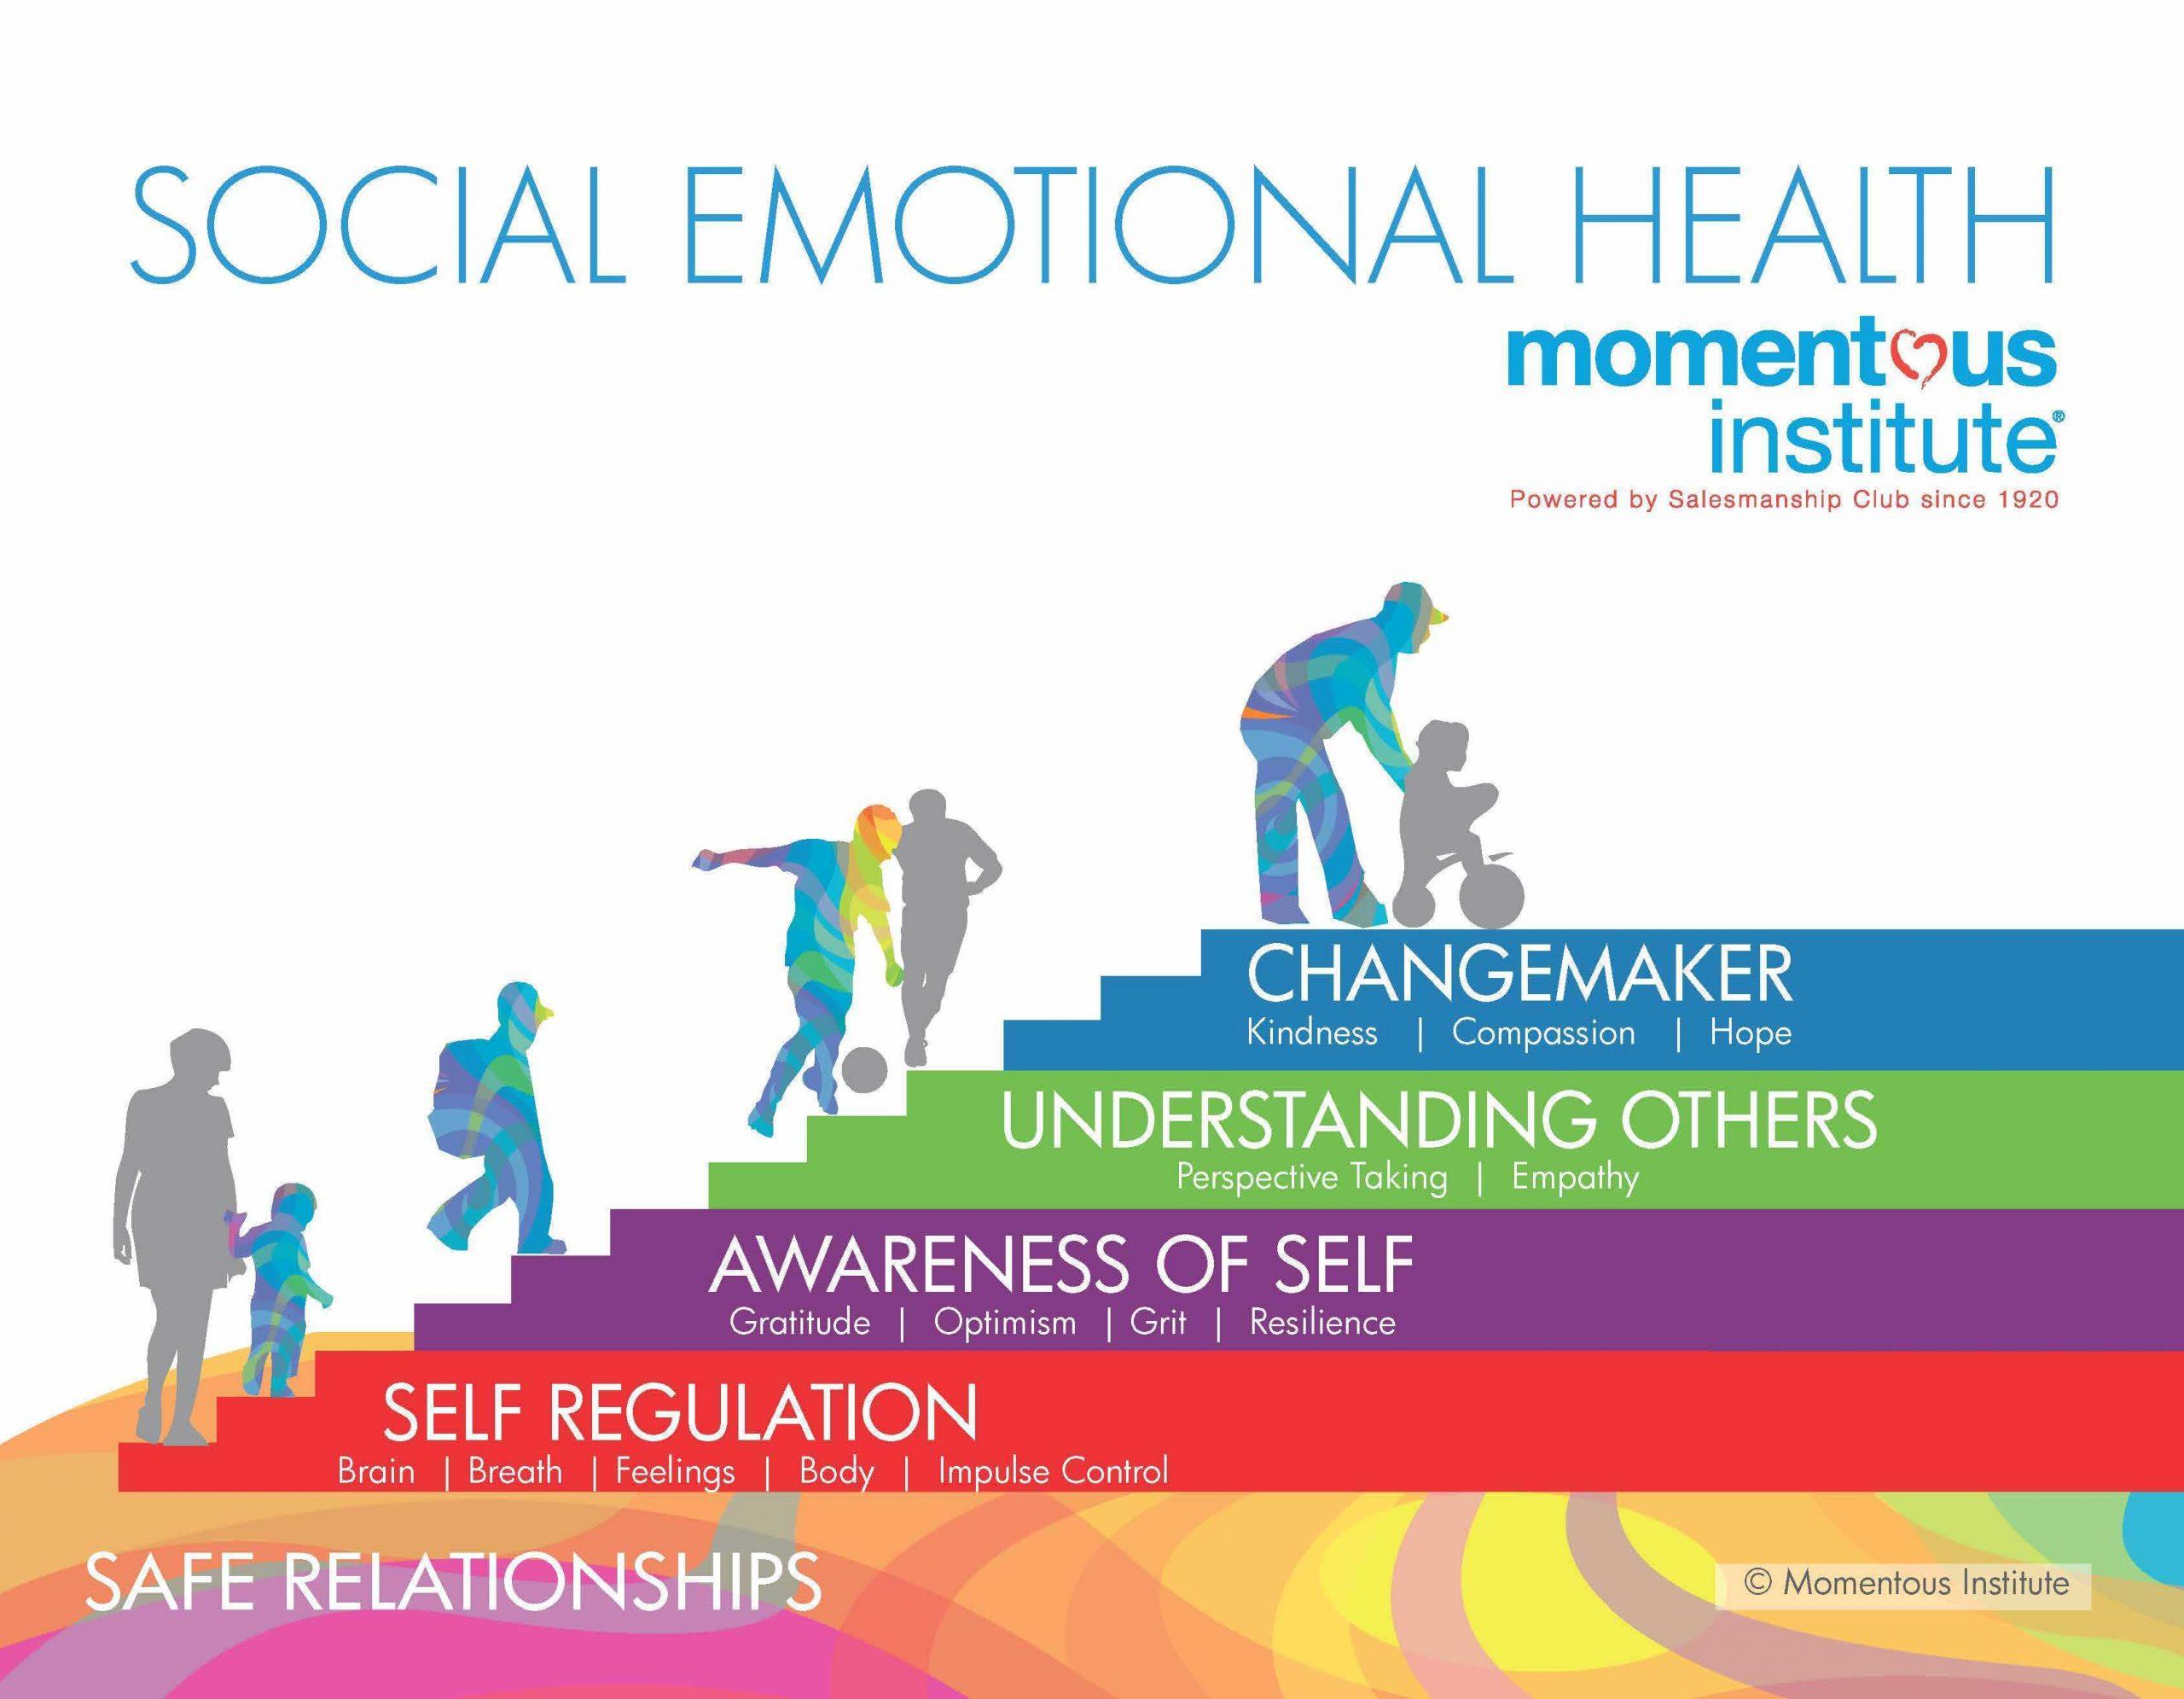 Social Emotional Health